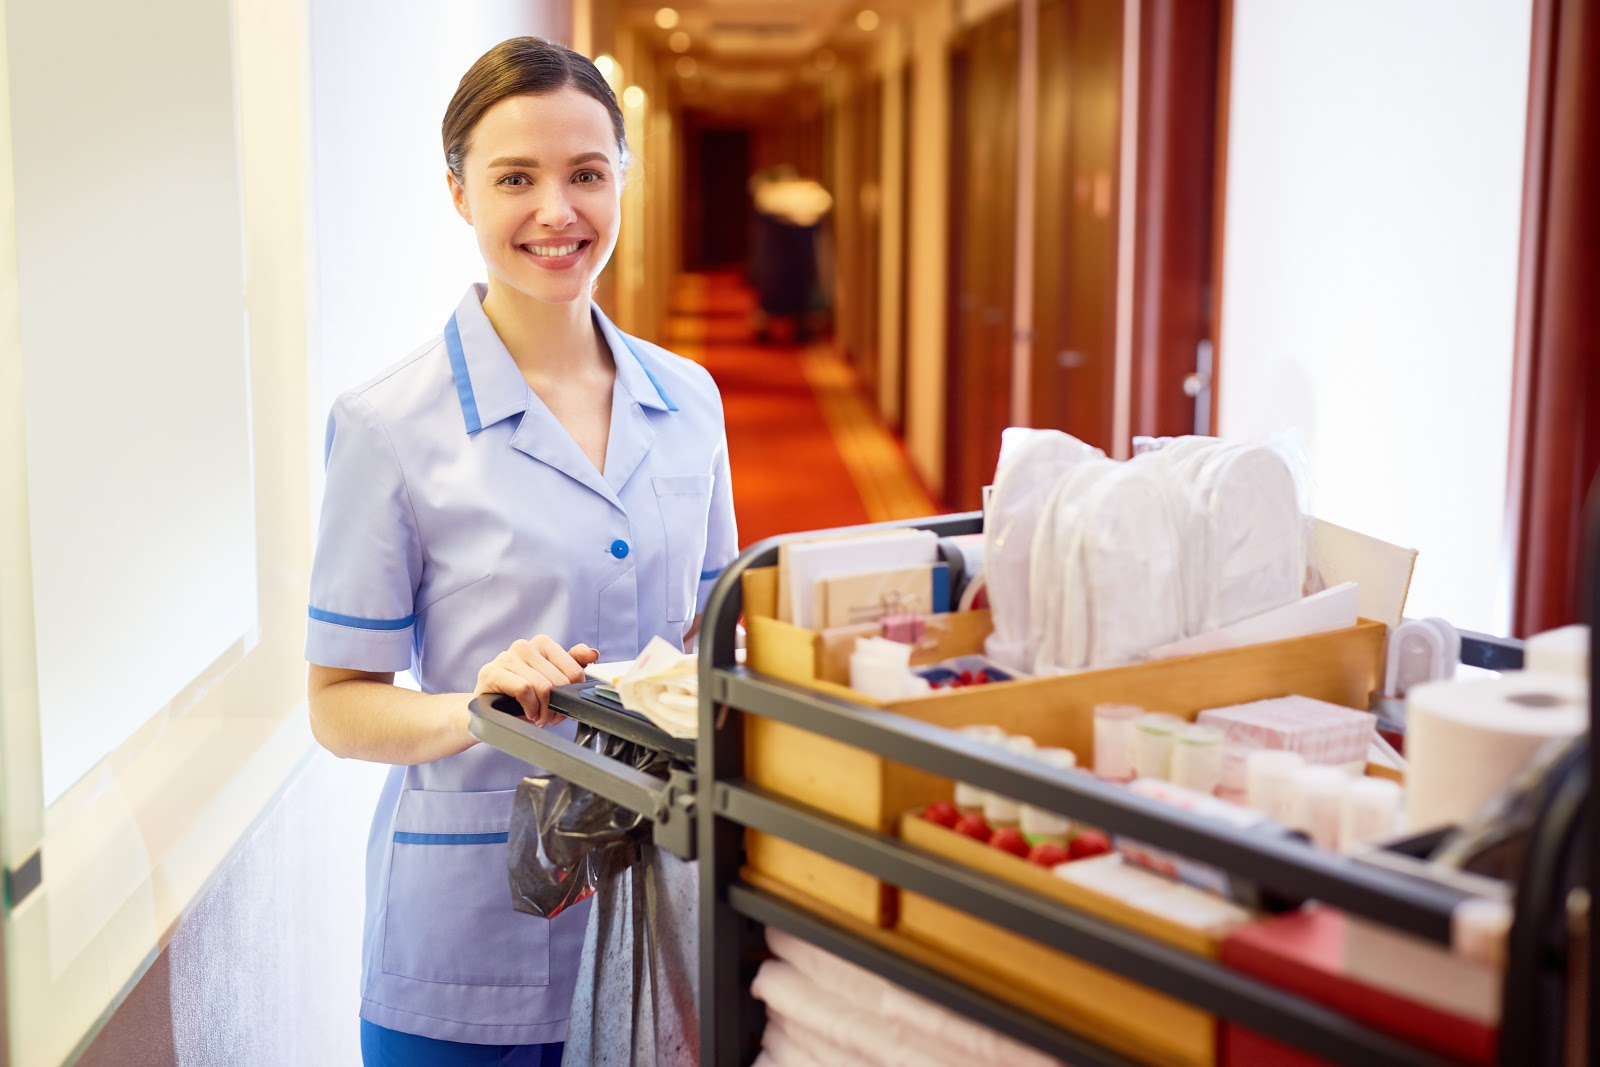 Aufgaben im Housekeeping